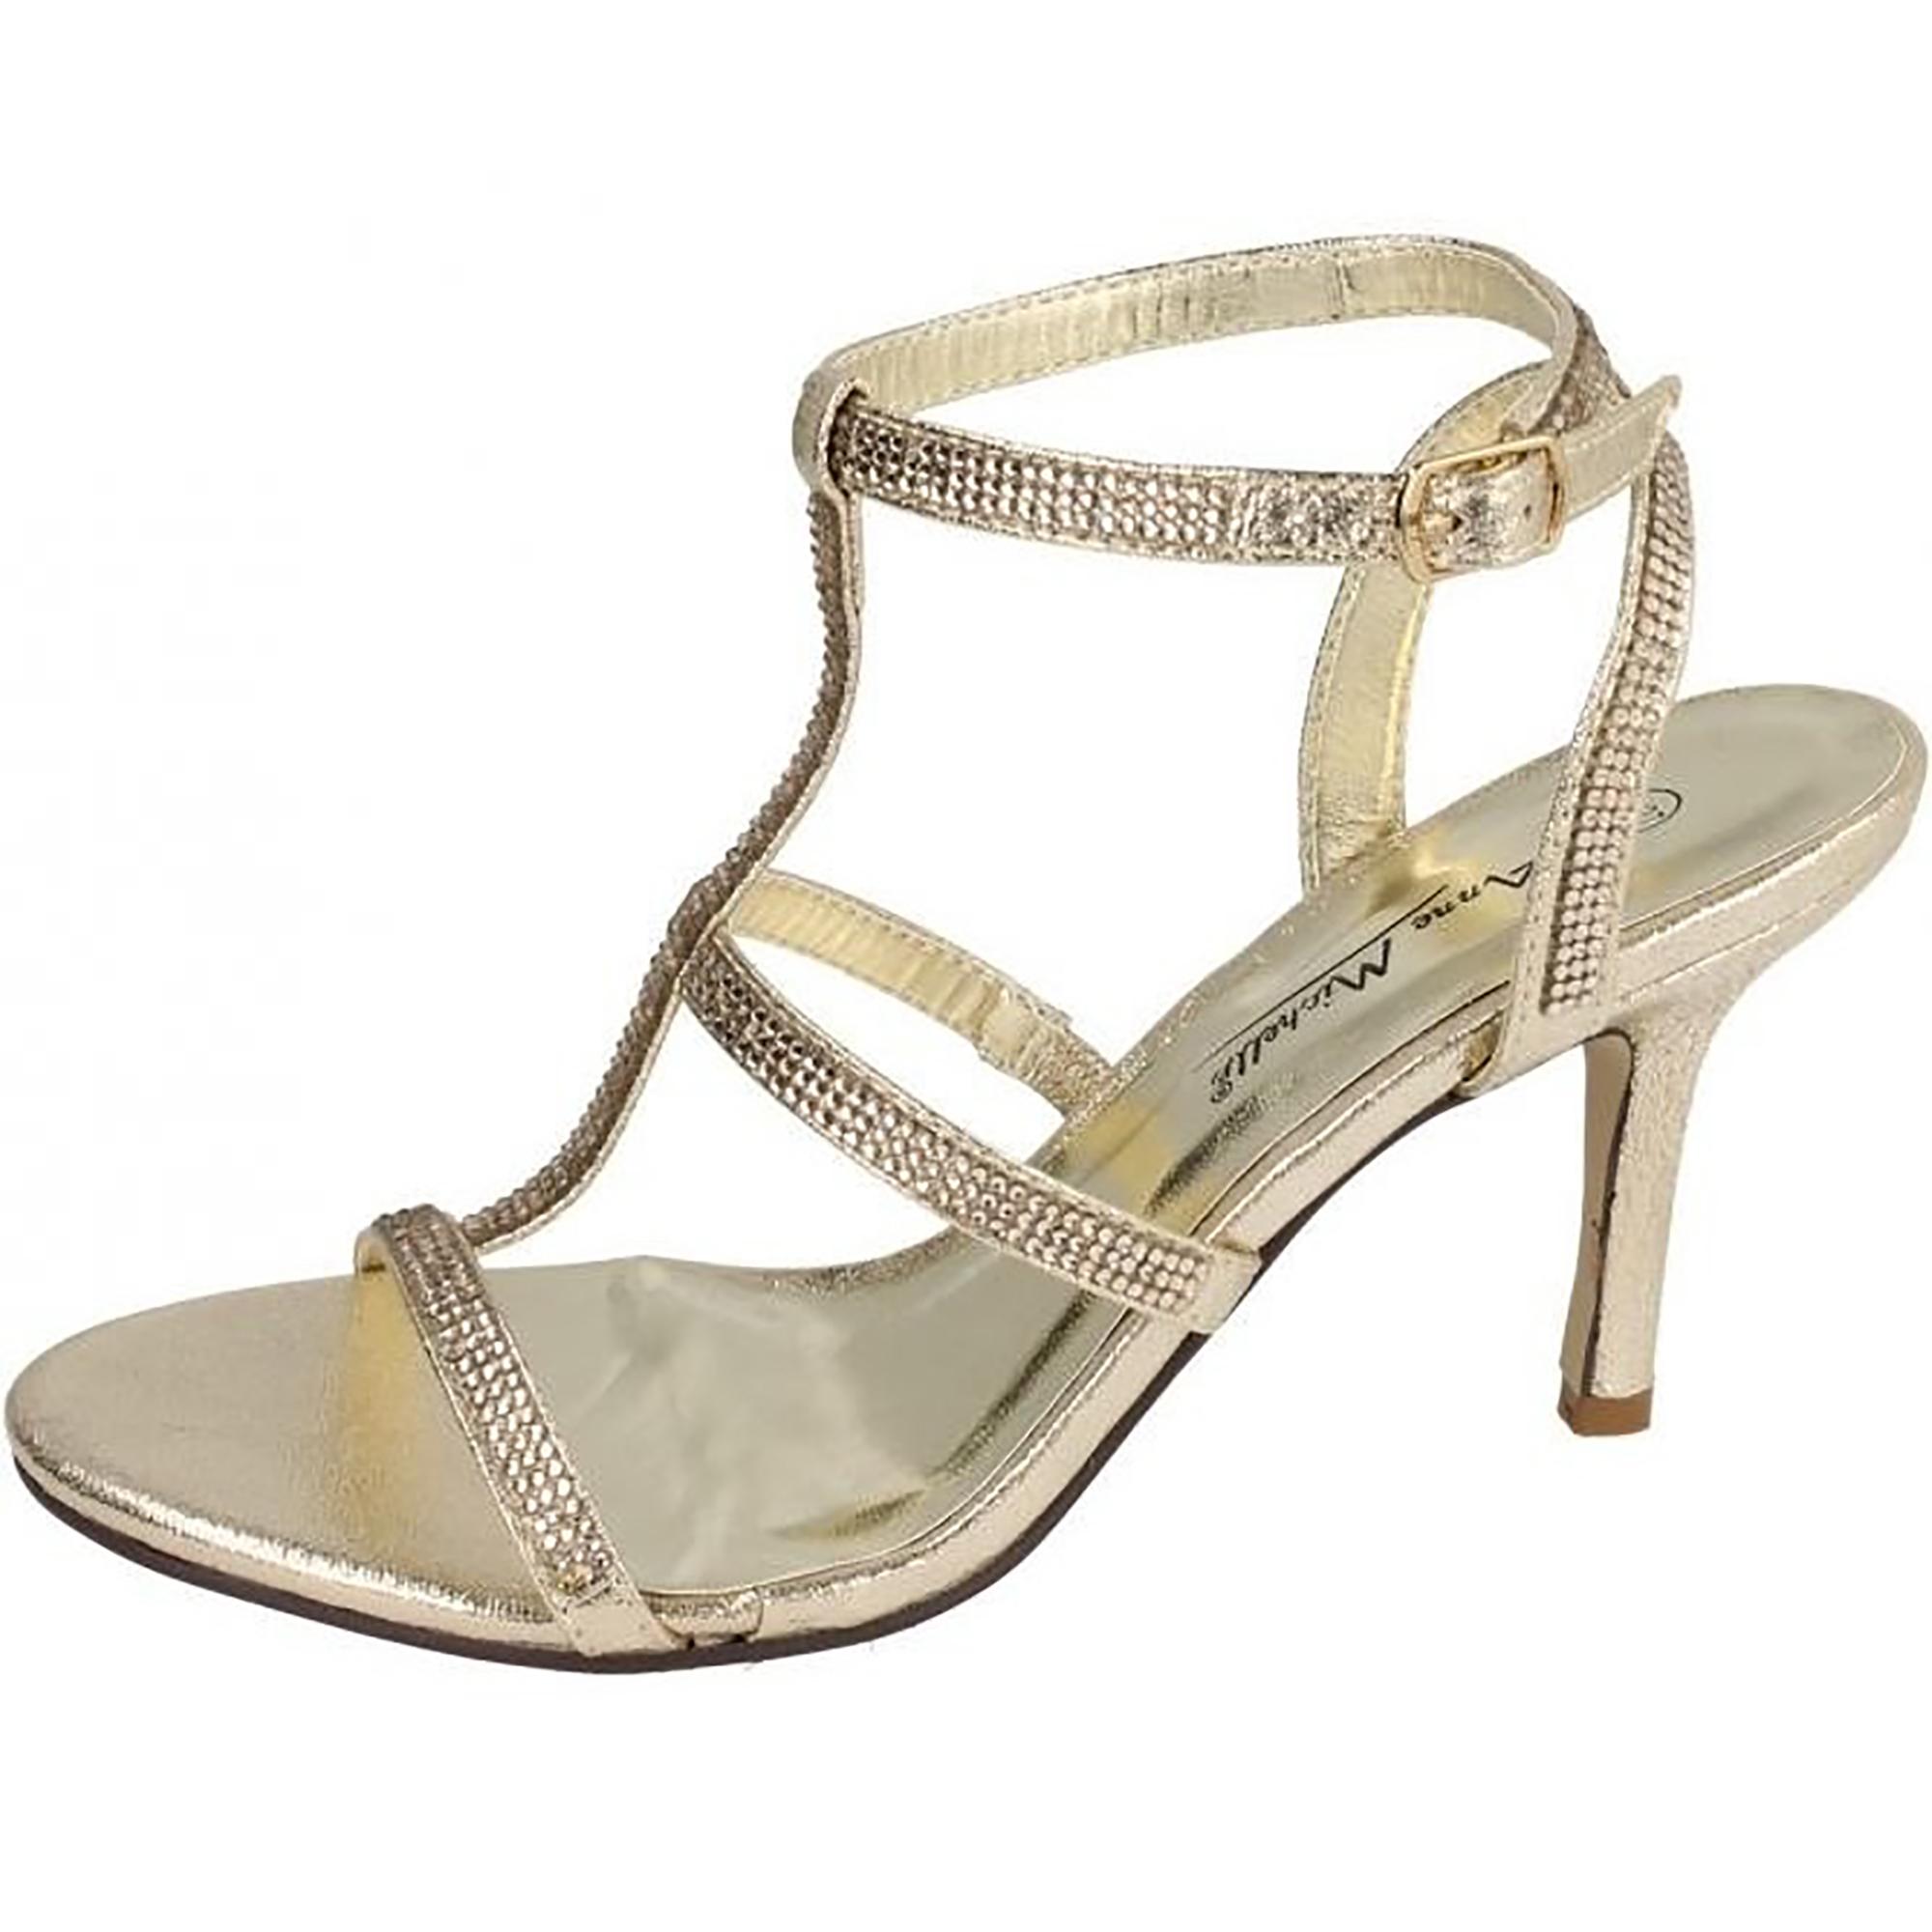 Anne Michelle Womens/Ladies Diamante H Bar Evening Sandals (7 UK) (Champagne)